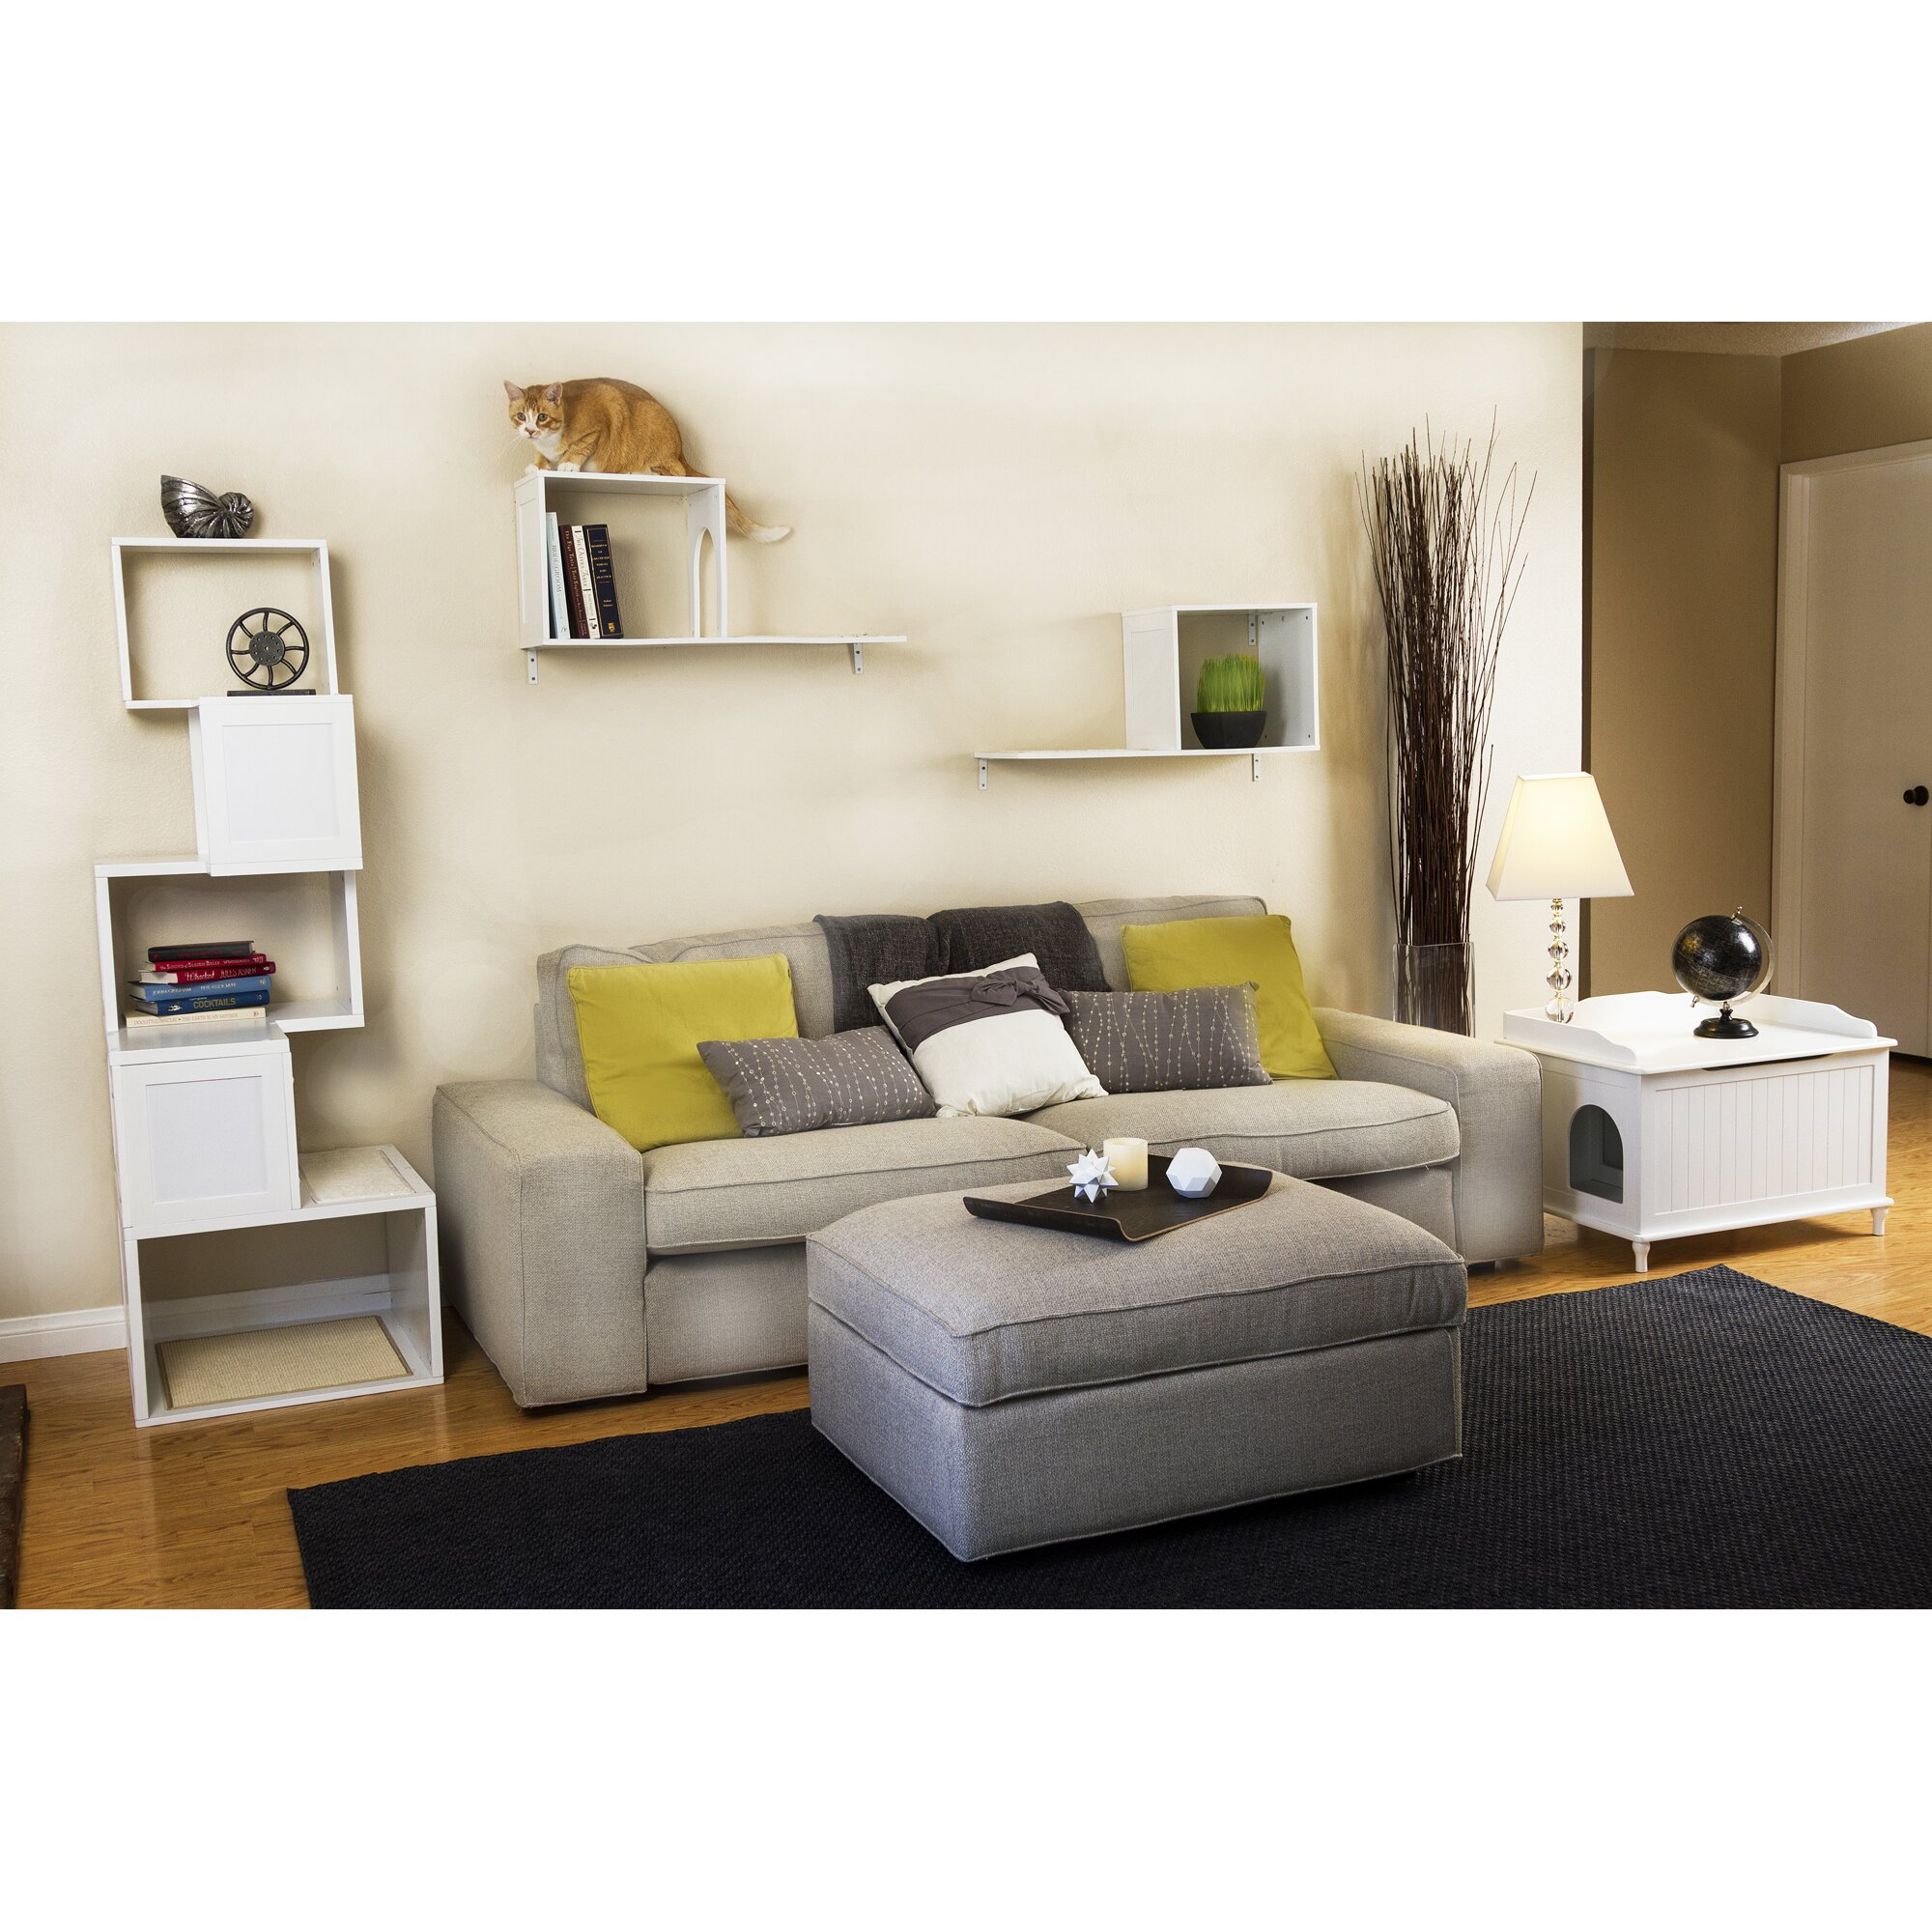 Mia Bedroom Furniture Mia Litter Box Enclosure Reviews Allmodern